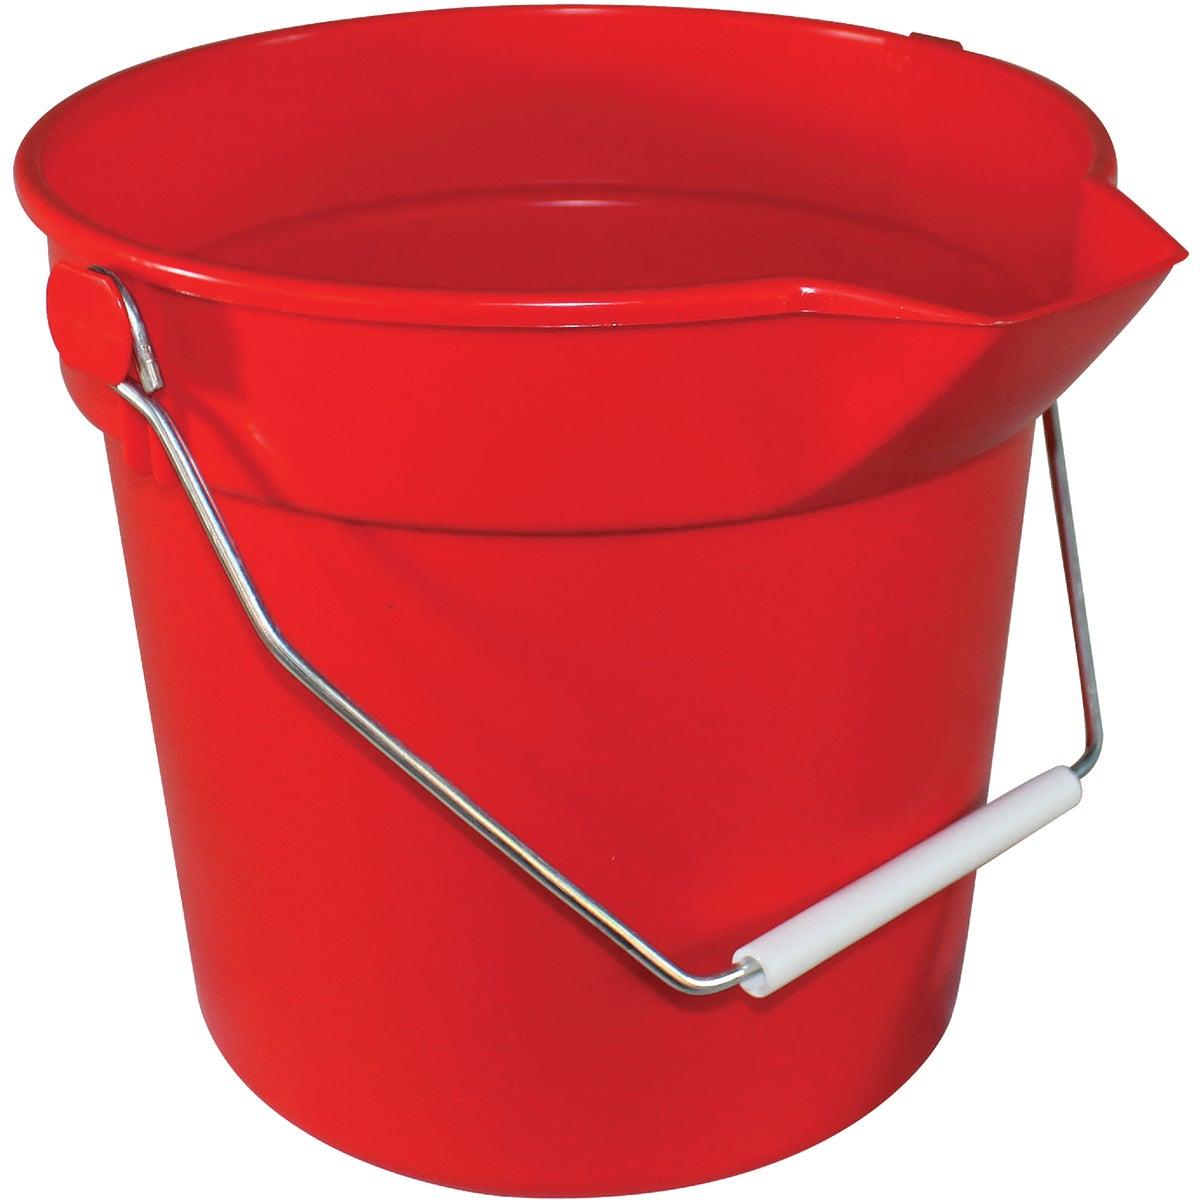 10 Quart Red Bucket